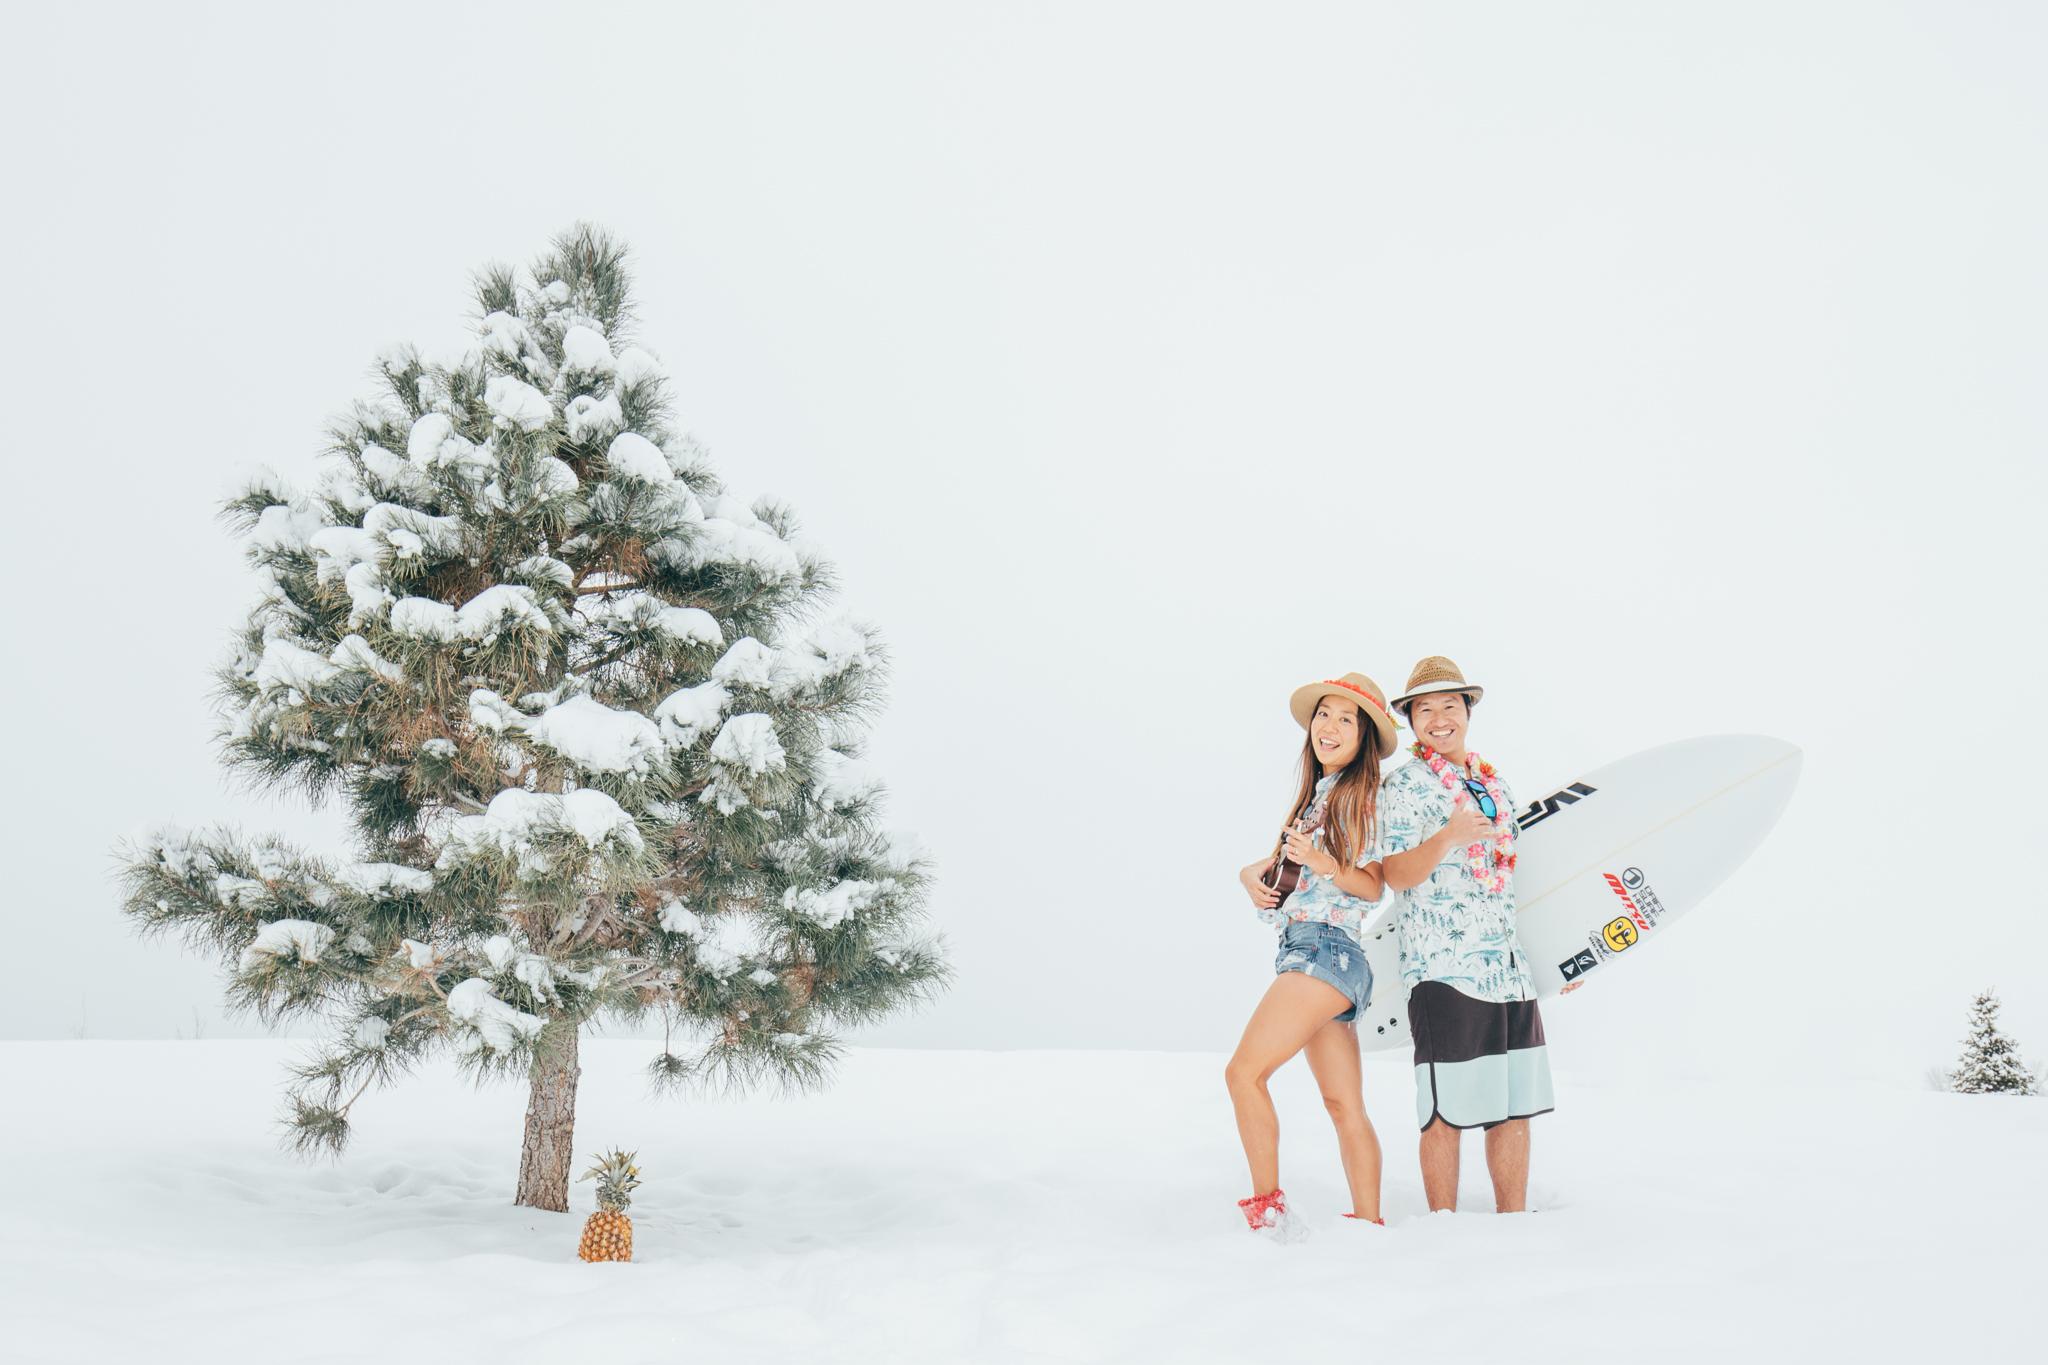 A Happy New Year everyone!!! Wishing you a bright 2017!  Aloha from Montana  明けましておめでとうございます!!  今年も皆様にとって、健康で明るくハッピーな年でありますように。  2017年もどうぞ宜しくお願いします!  Aloha  Takako